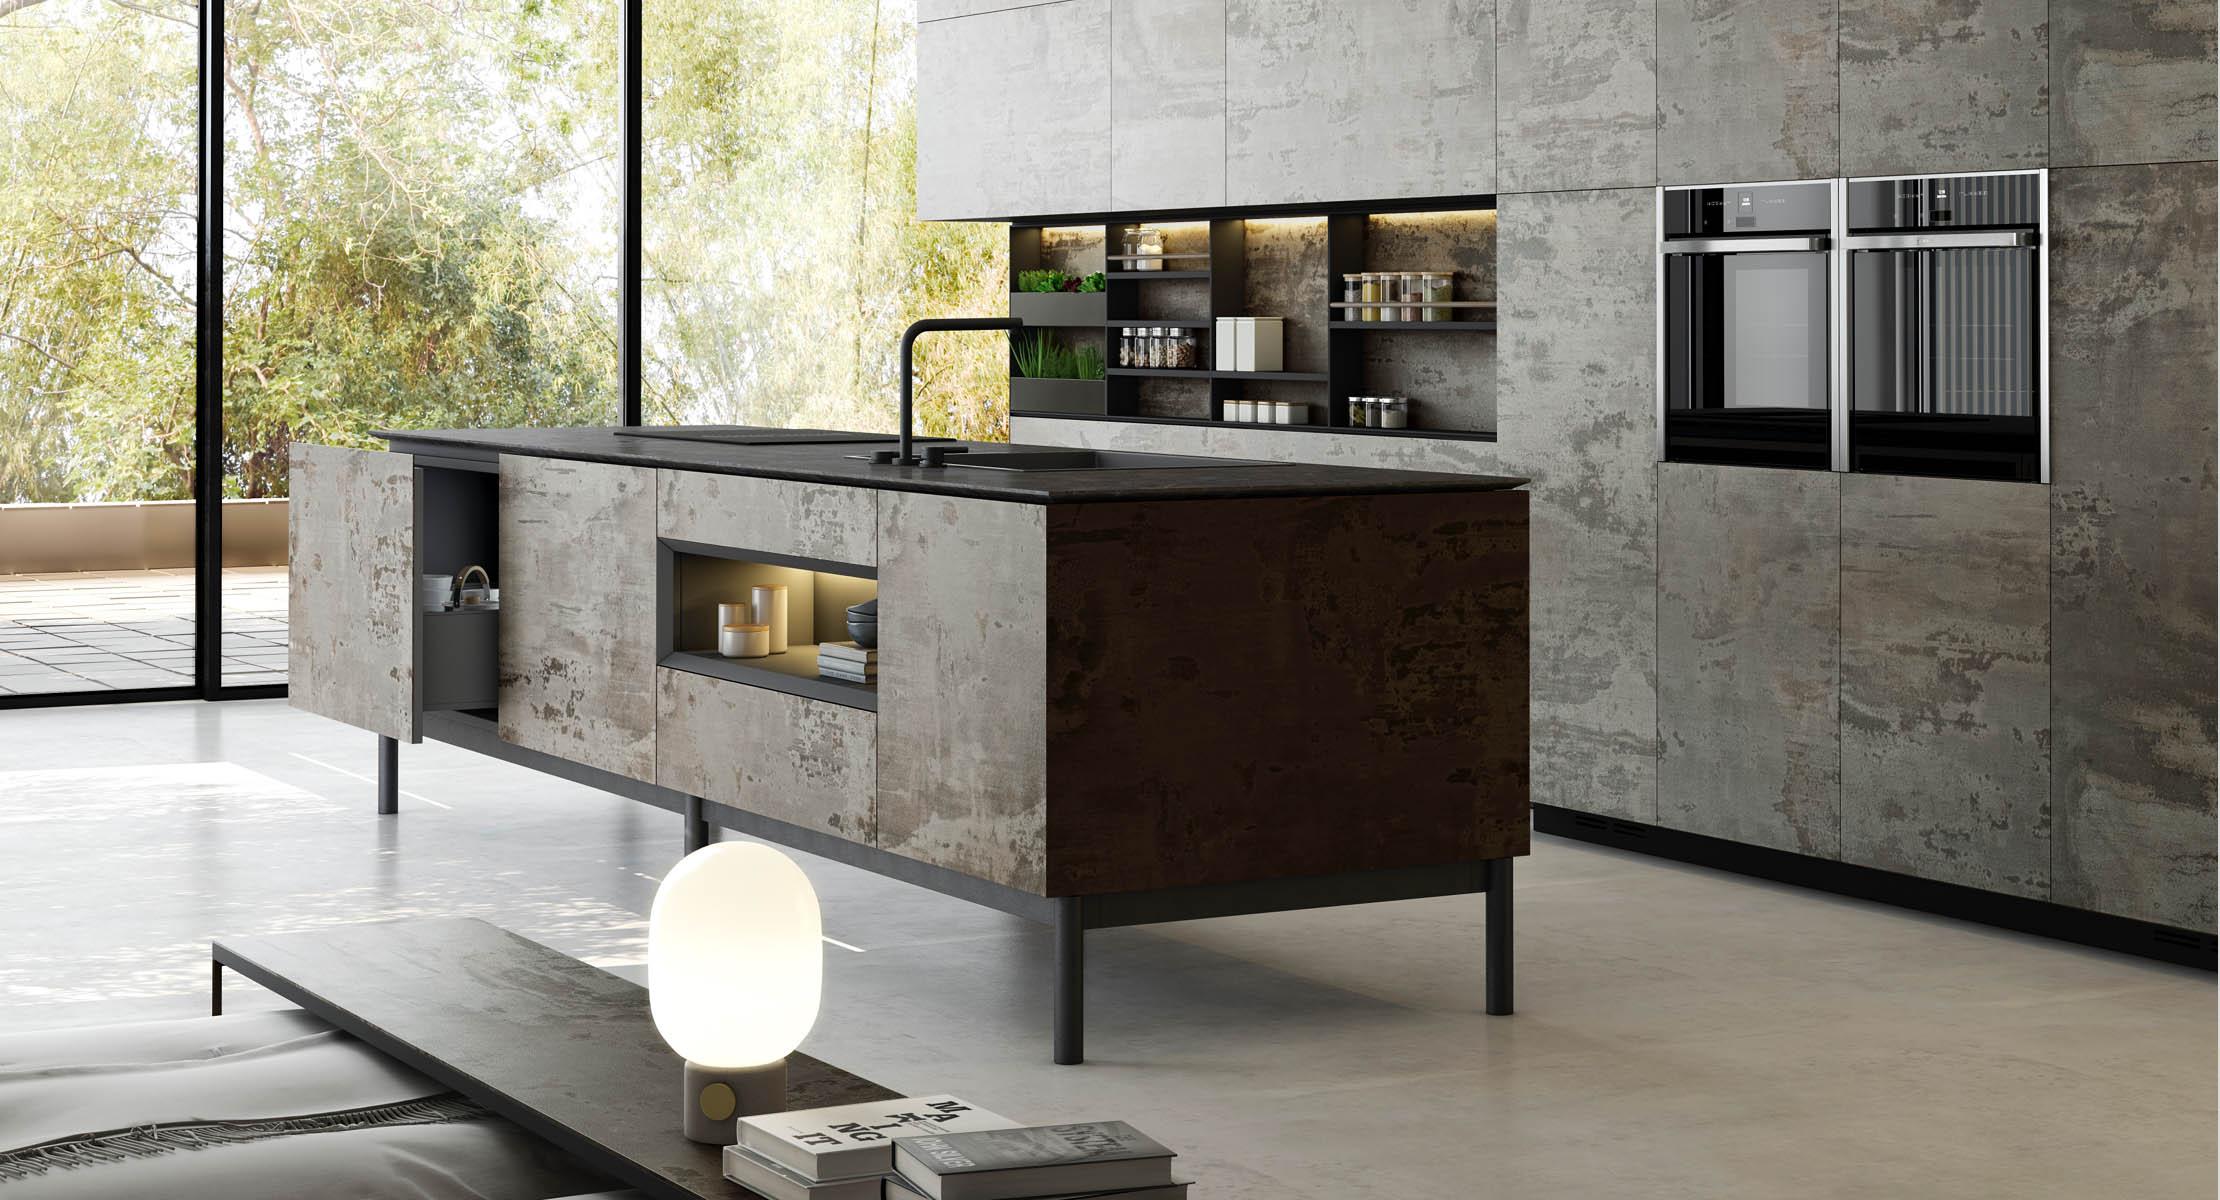 Image of mobiliario large in Furniture - Cosentino